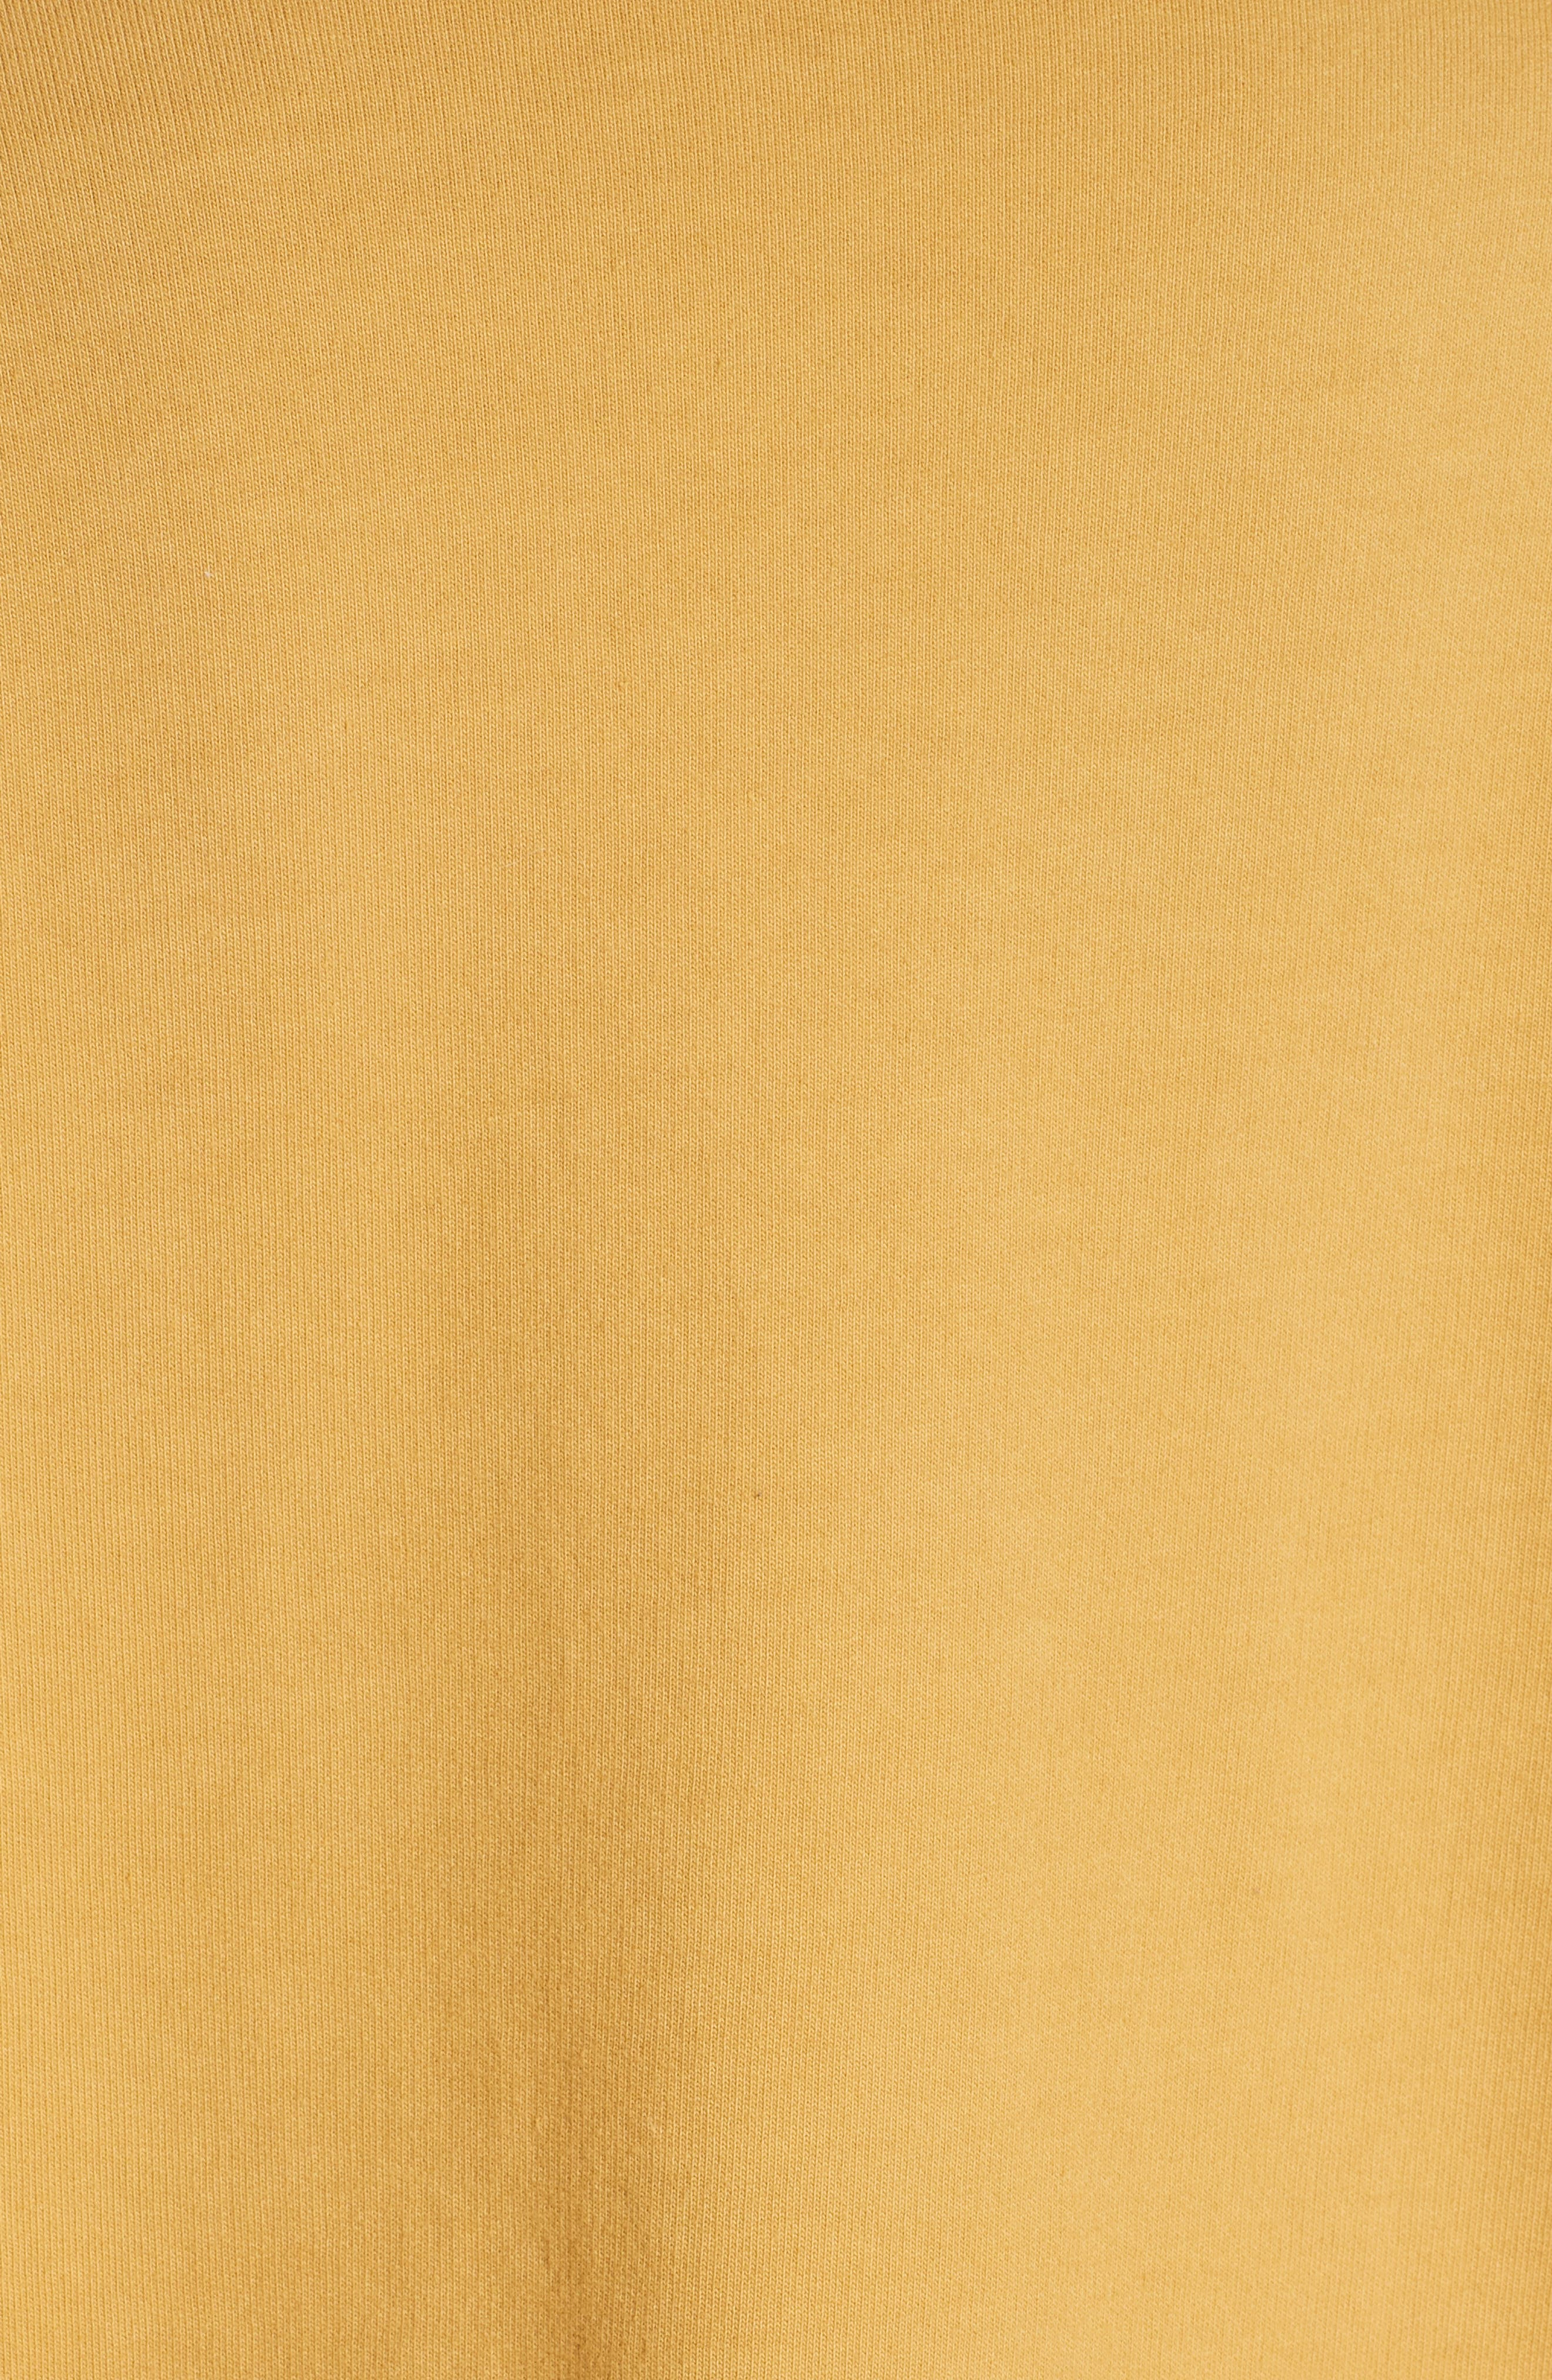 Bow Colorblock Sweatshirt,                             Alternate thumbnail 5, color,                             MUSTARD/ WHITE